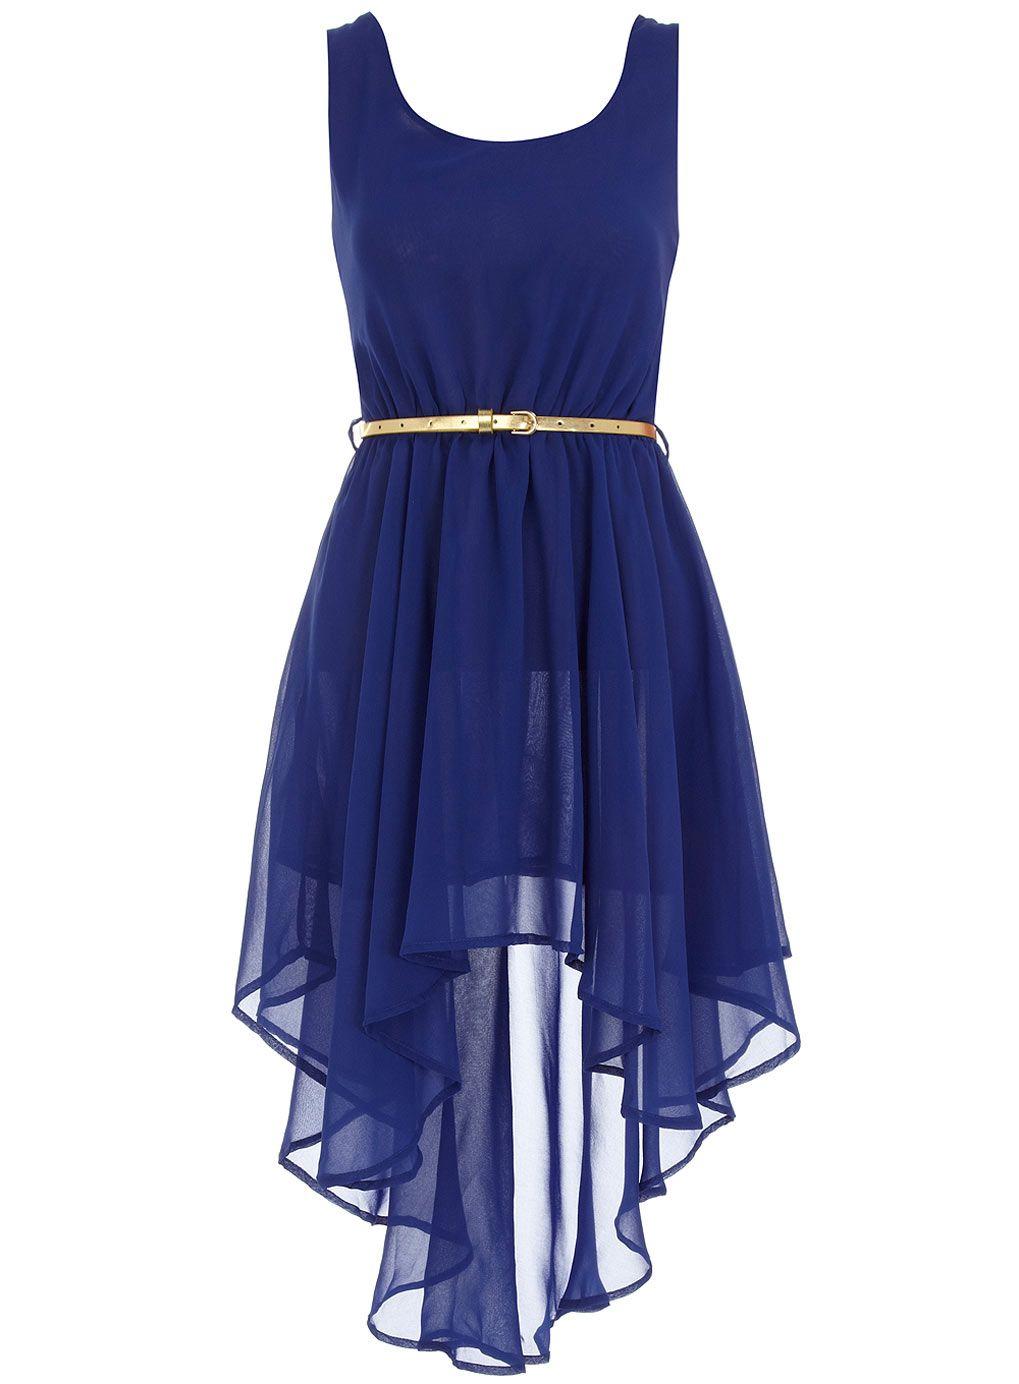 Aysmmetric royal blue dress -   Dresses   Pinterest   Royal blue ...